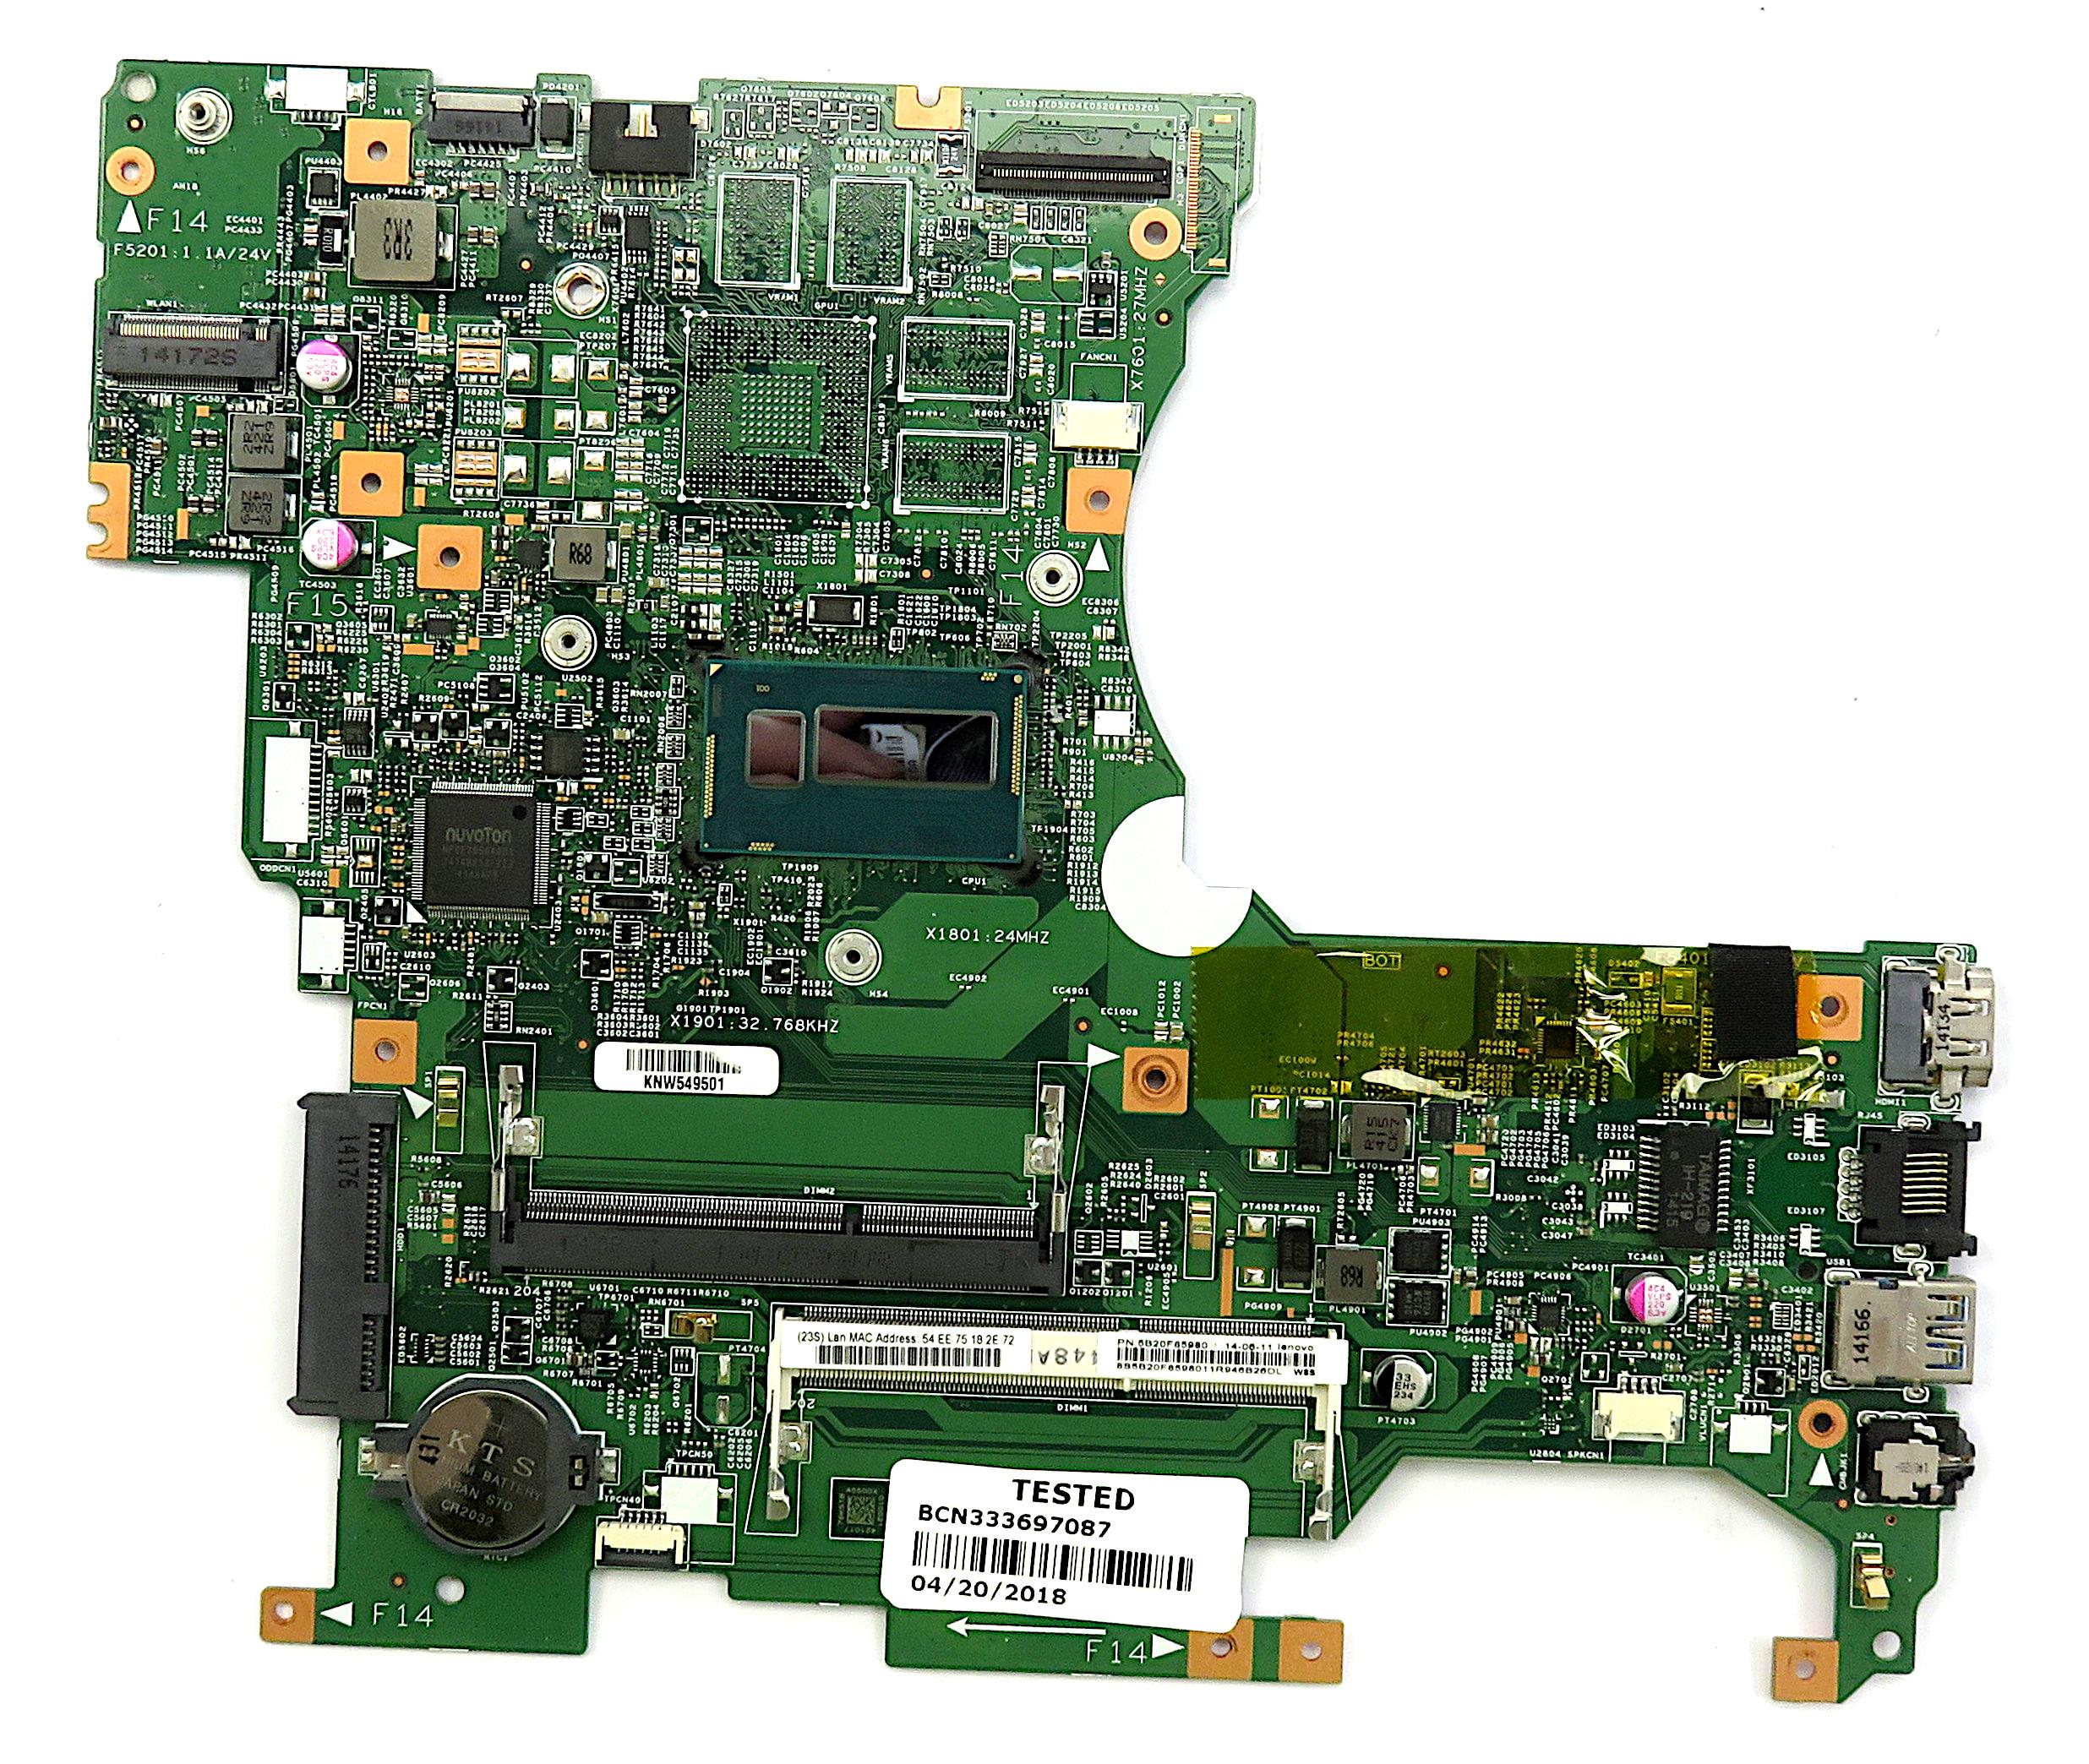 Lenovo 5B20F85980 Motherboard f/ Flex 2-14 Dual-Mode Laptop w/ i3-4010U